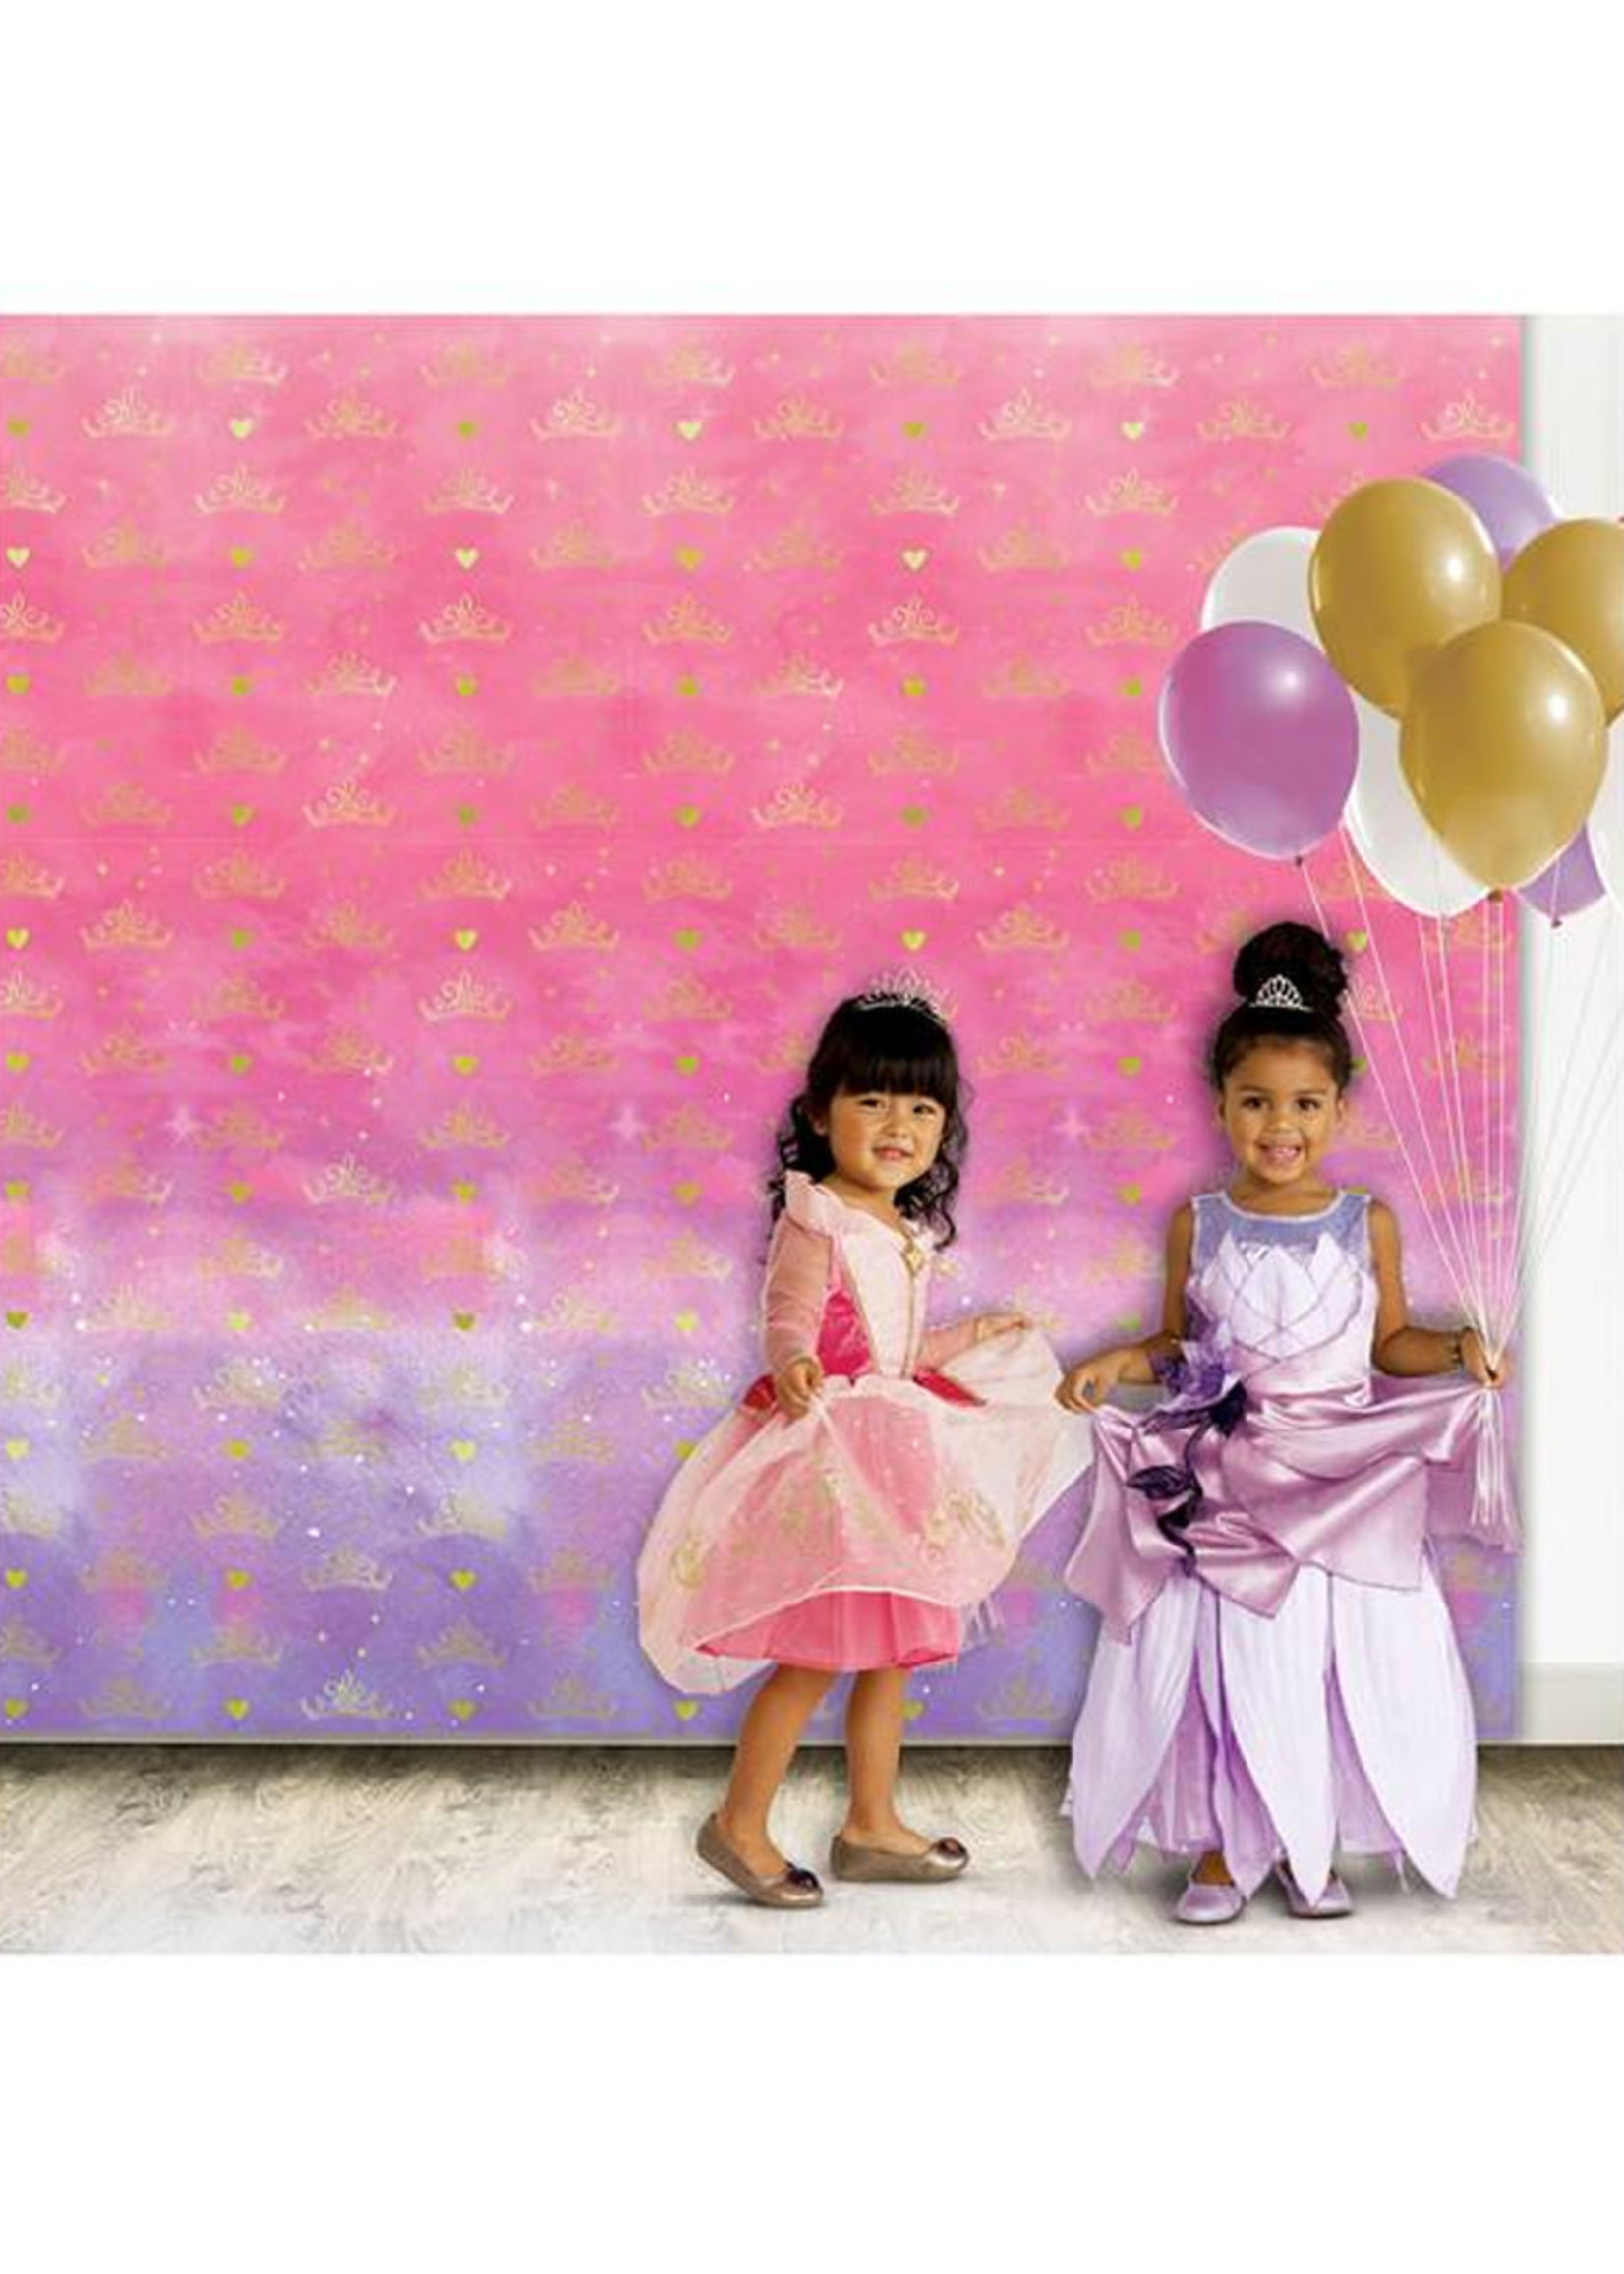 Disney Princess Once Upon A Time Photo Backdrop